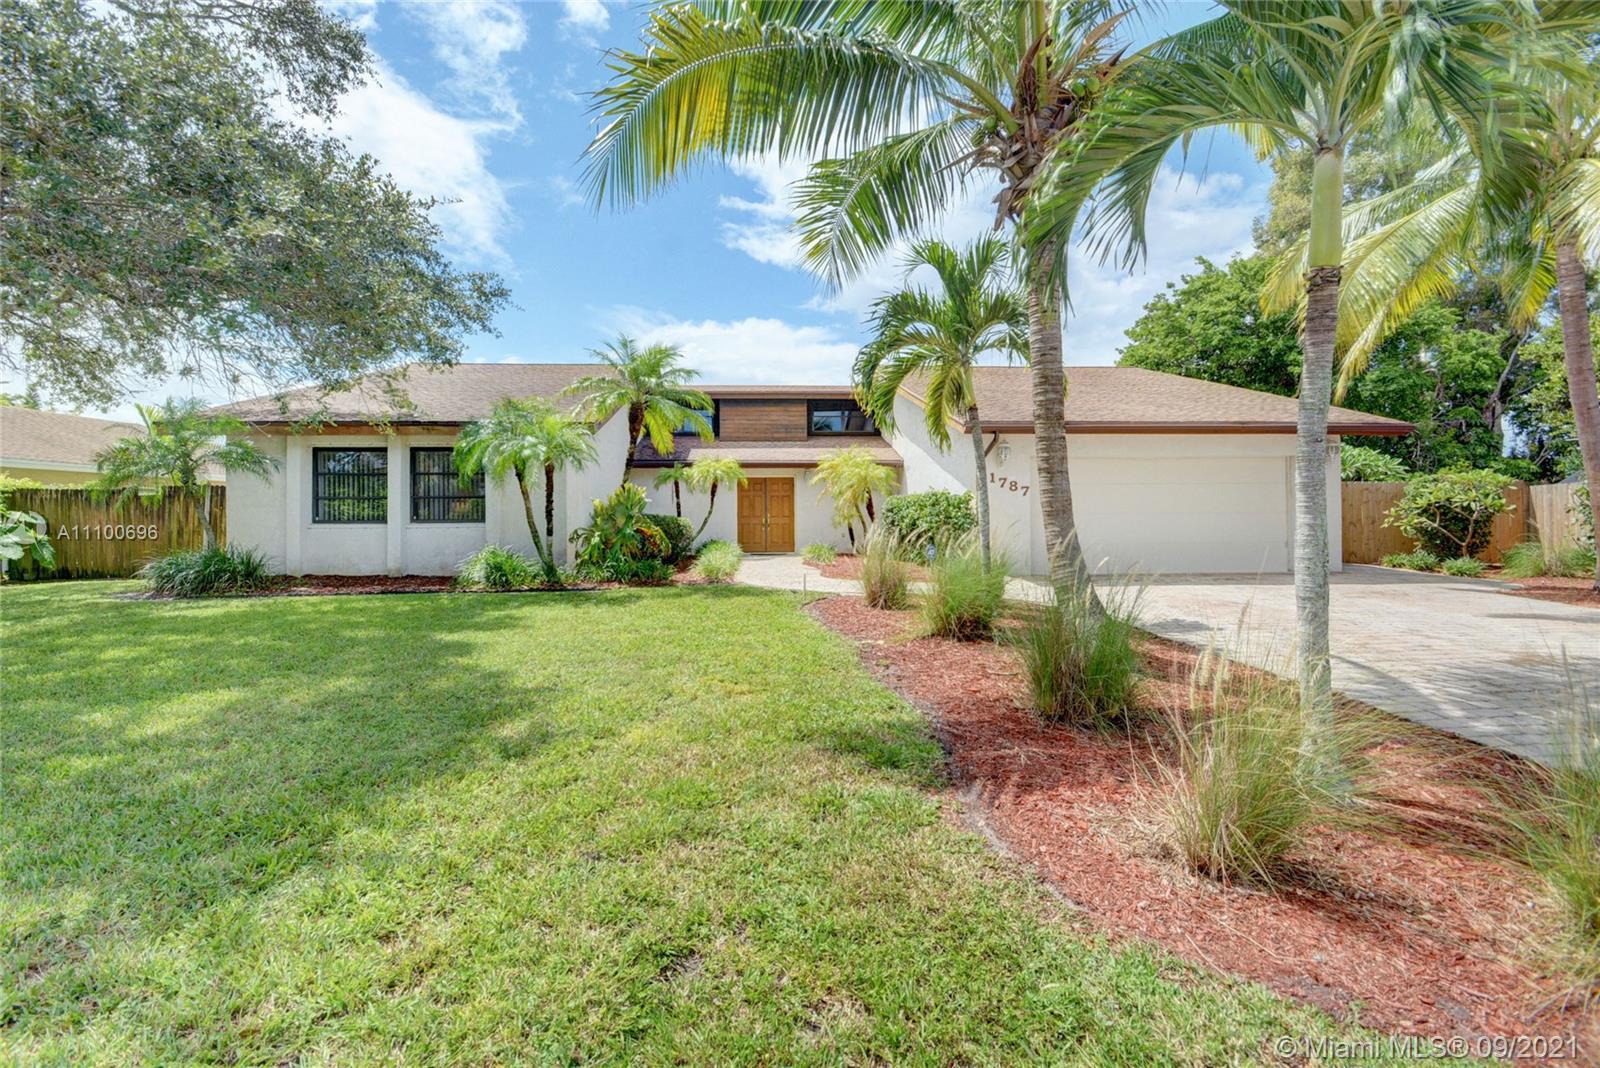 1787 Richard Ln, Palm Springs, Florida 33406